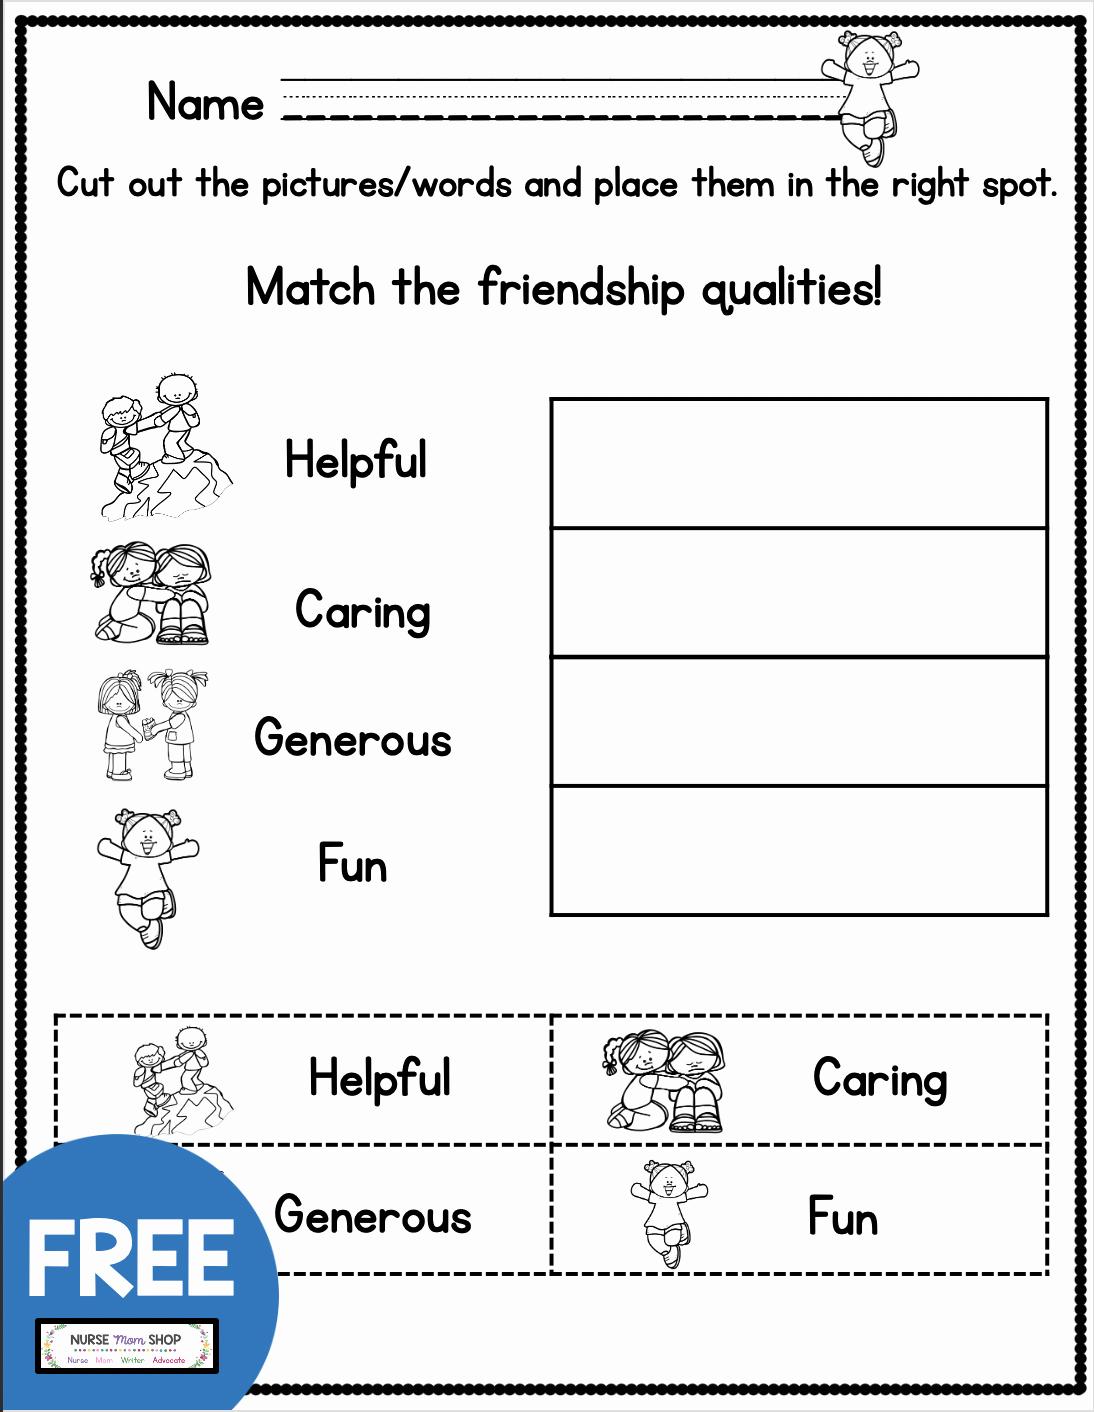 Social Skills Worksheets for Kindergarten Lovely Free Friendship tools Printables Teach Kindergarten and